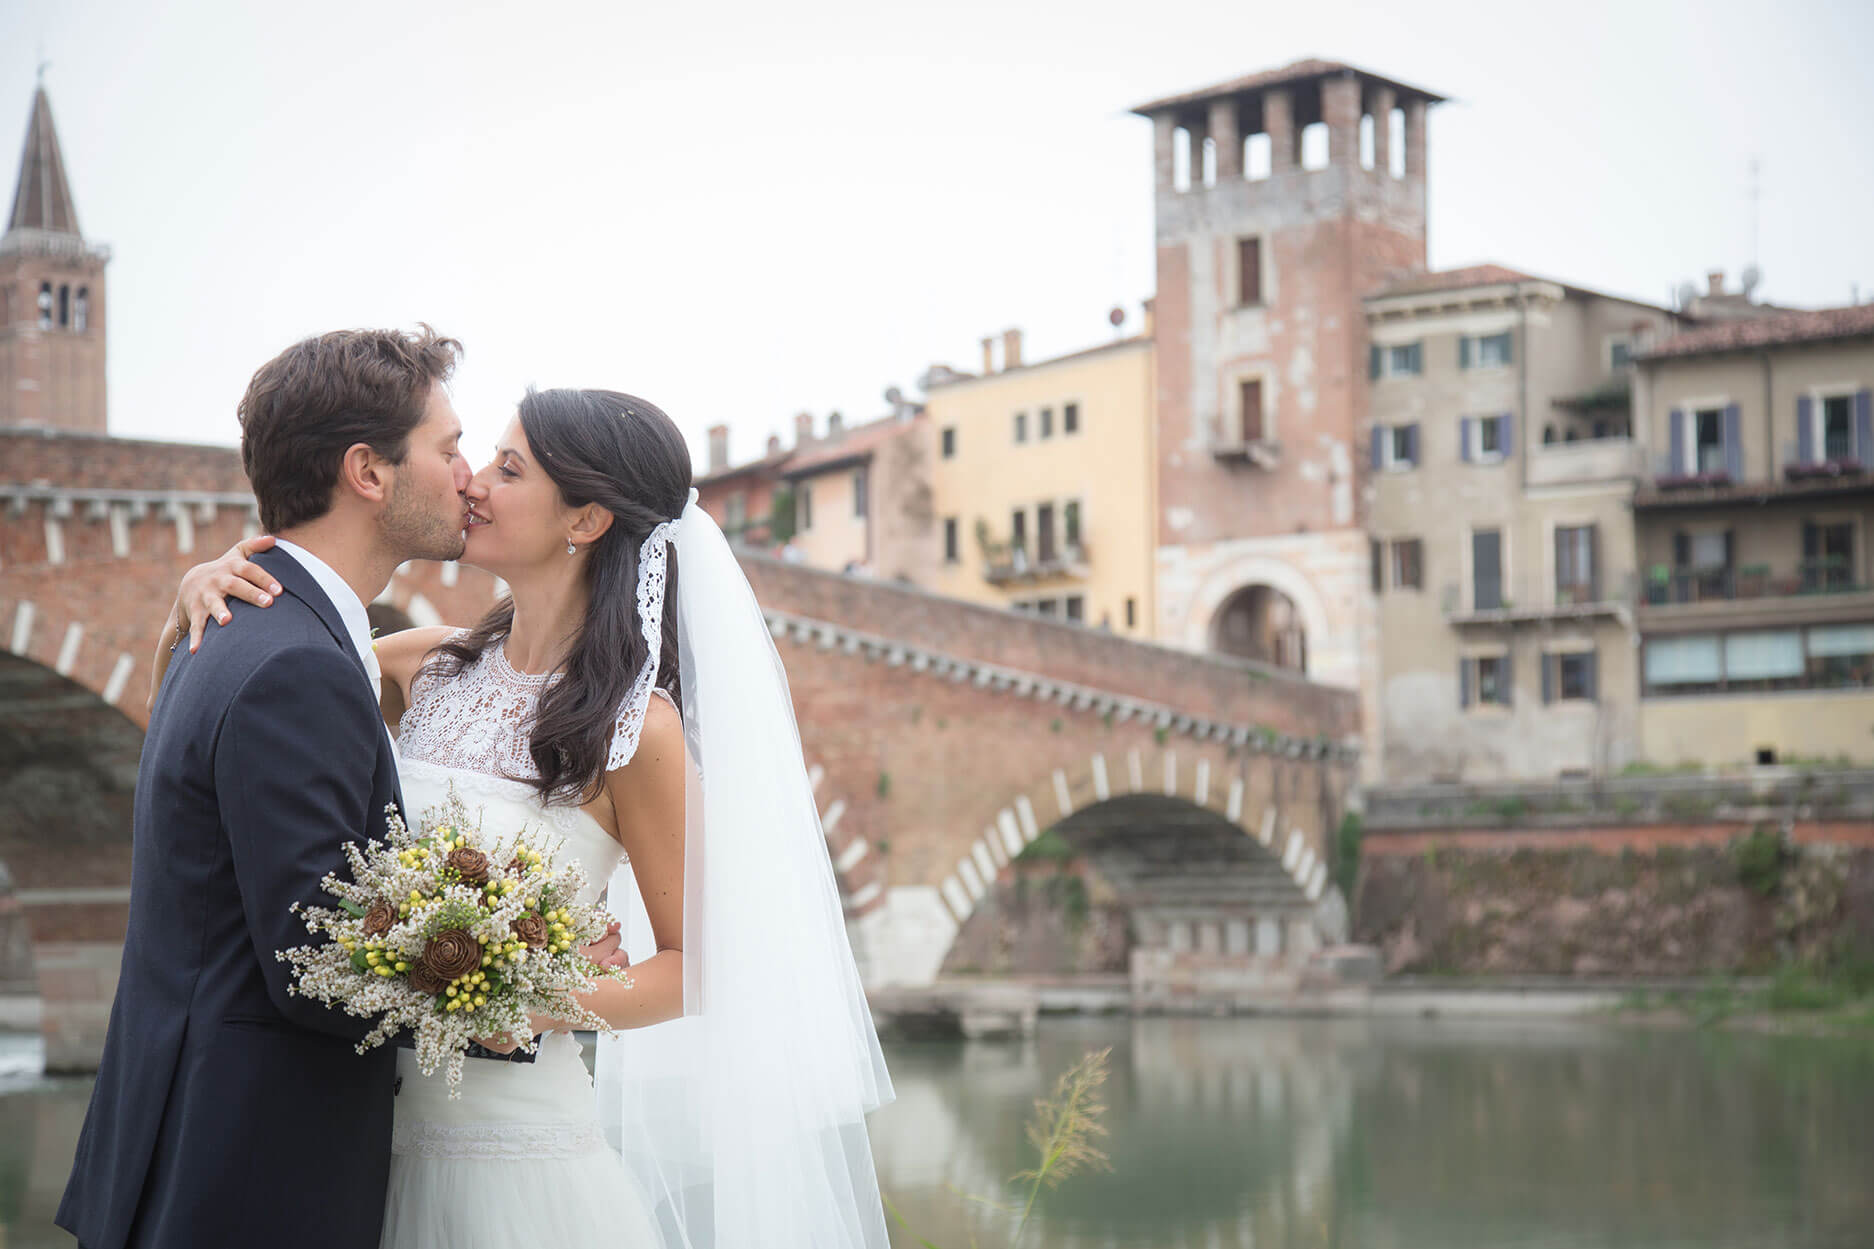 Francesca-Ferrati-WeddingIMG_0943